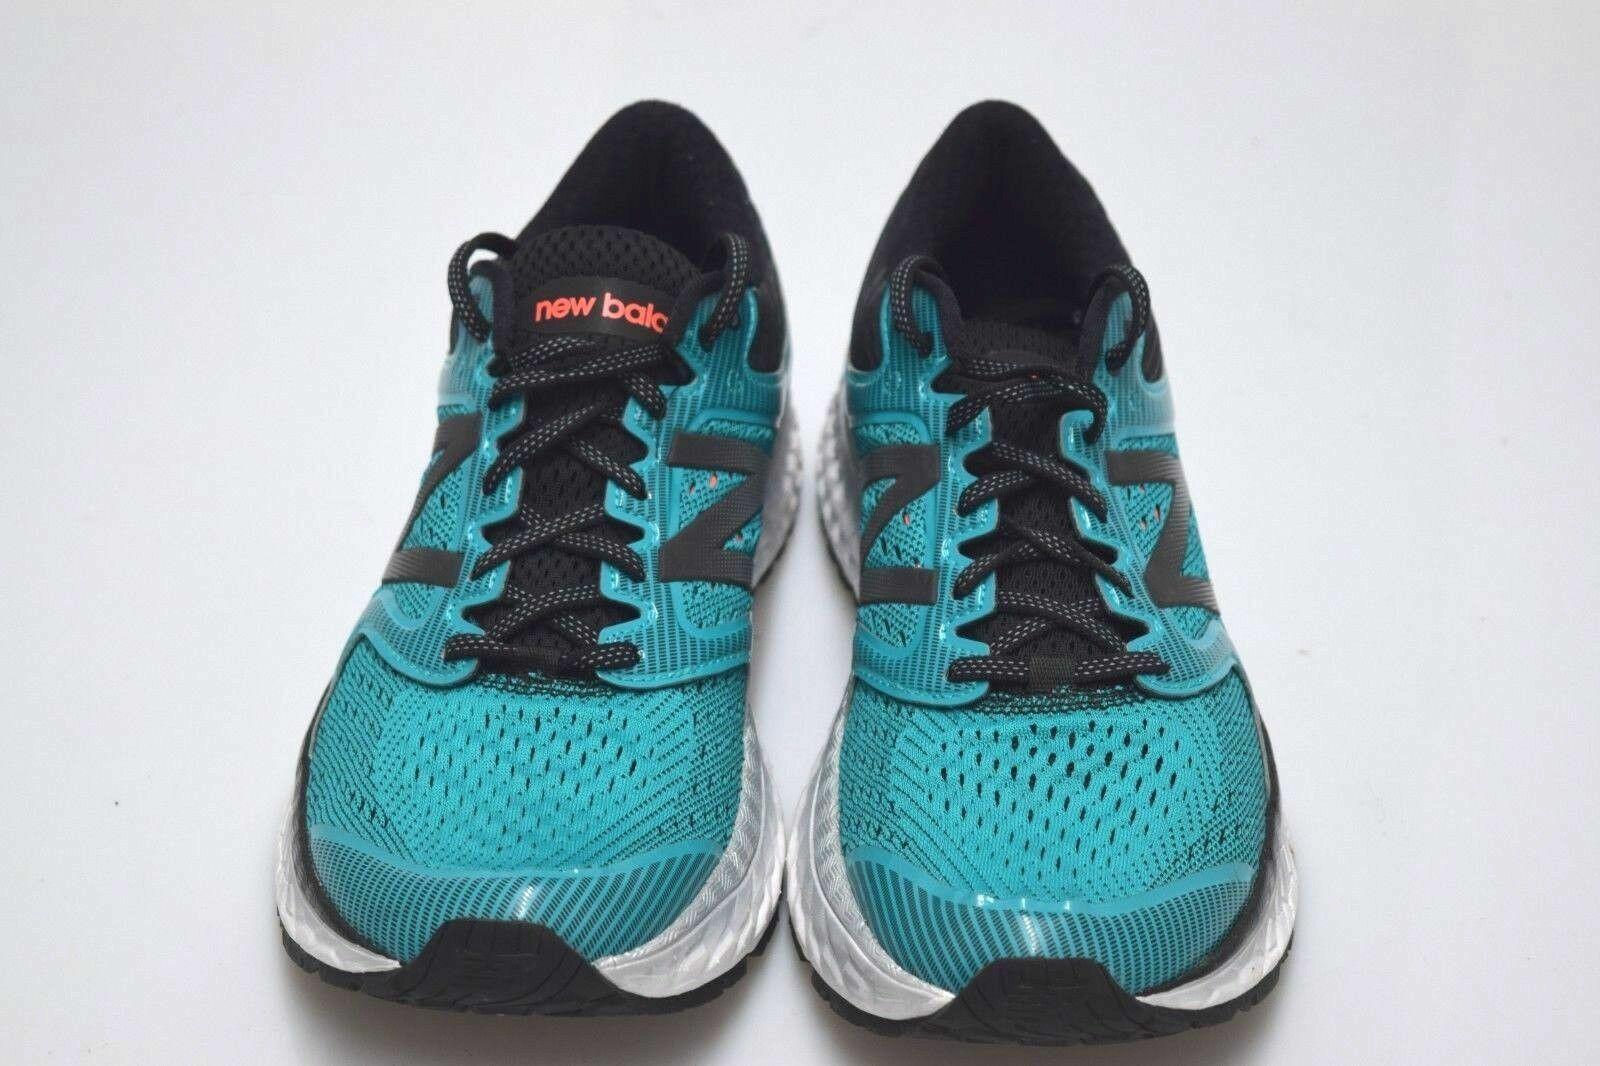 NEW BALANCE Fresh Foam 1080 v7 Men's shoes size 10